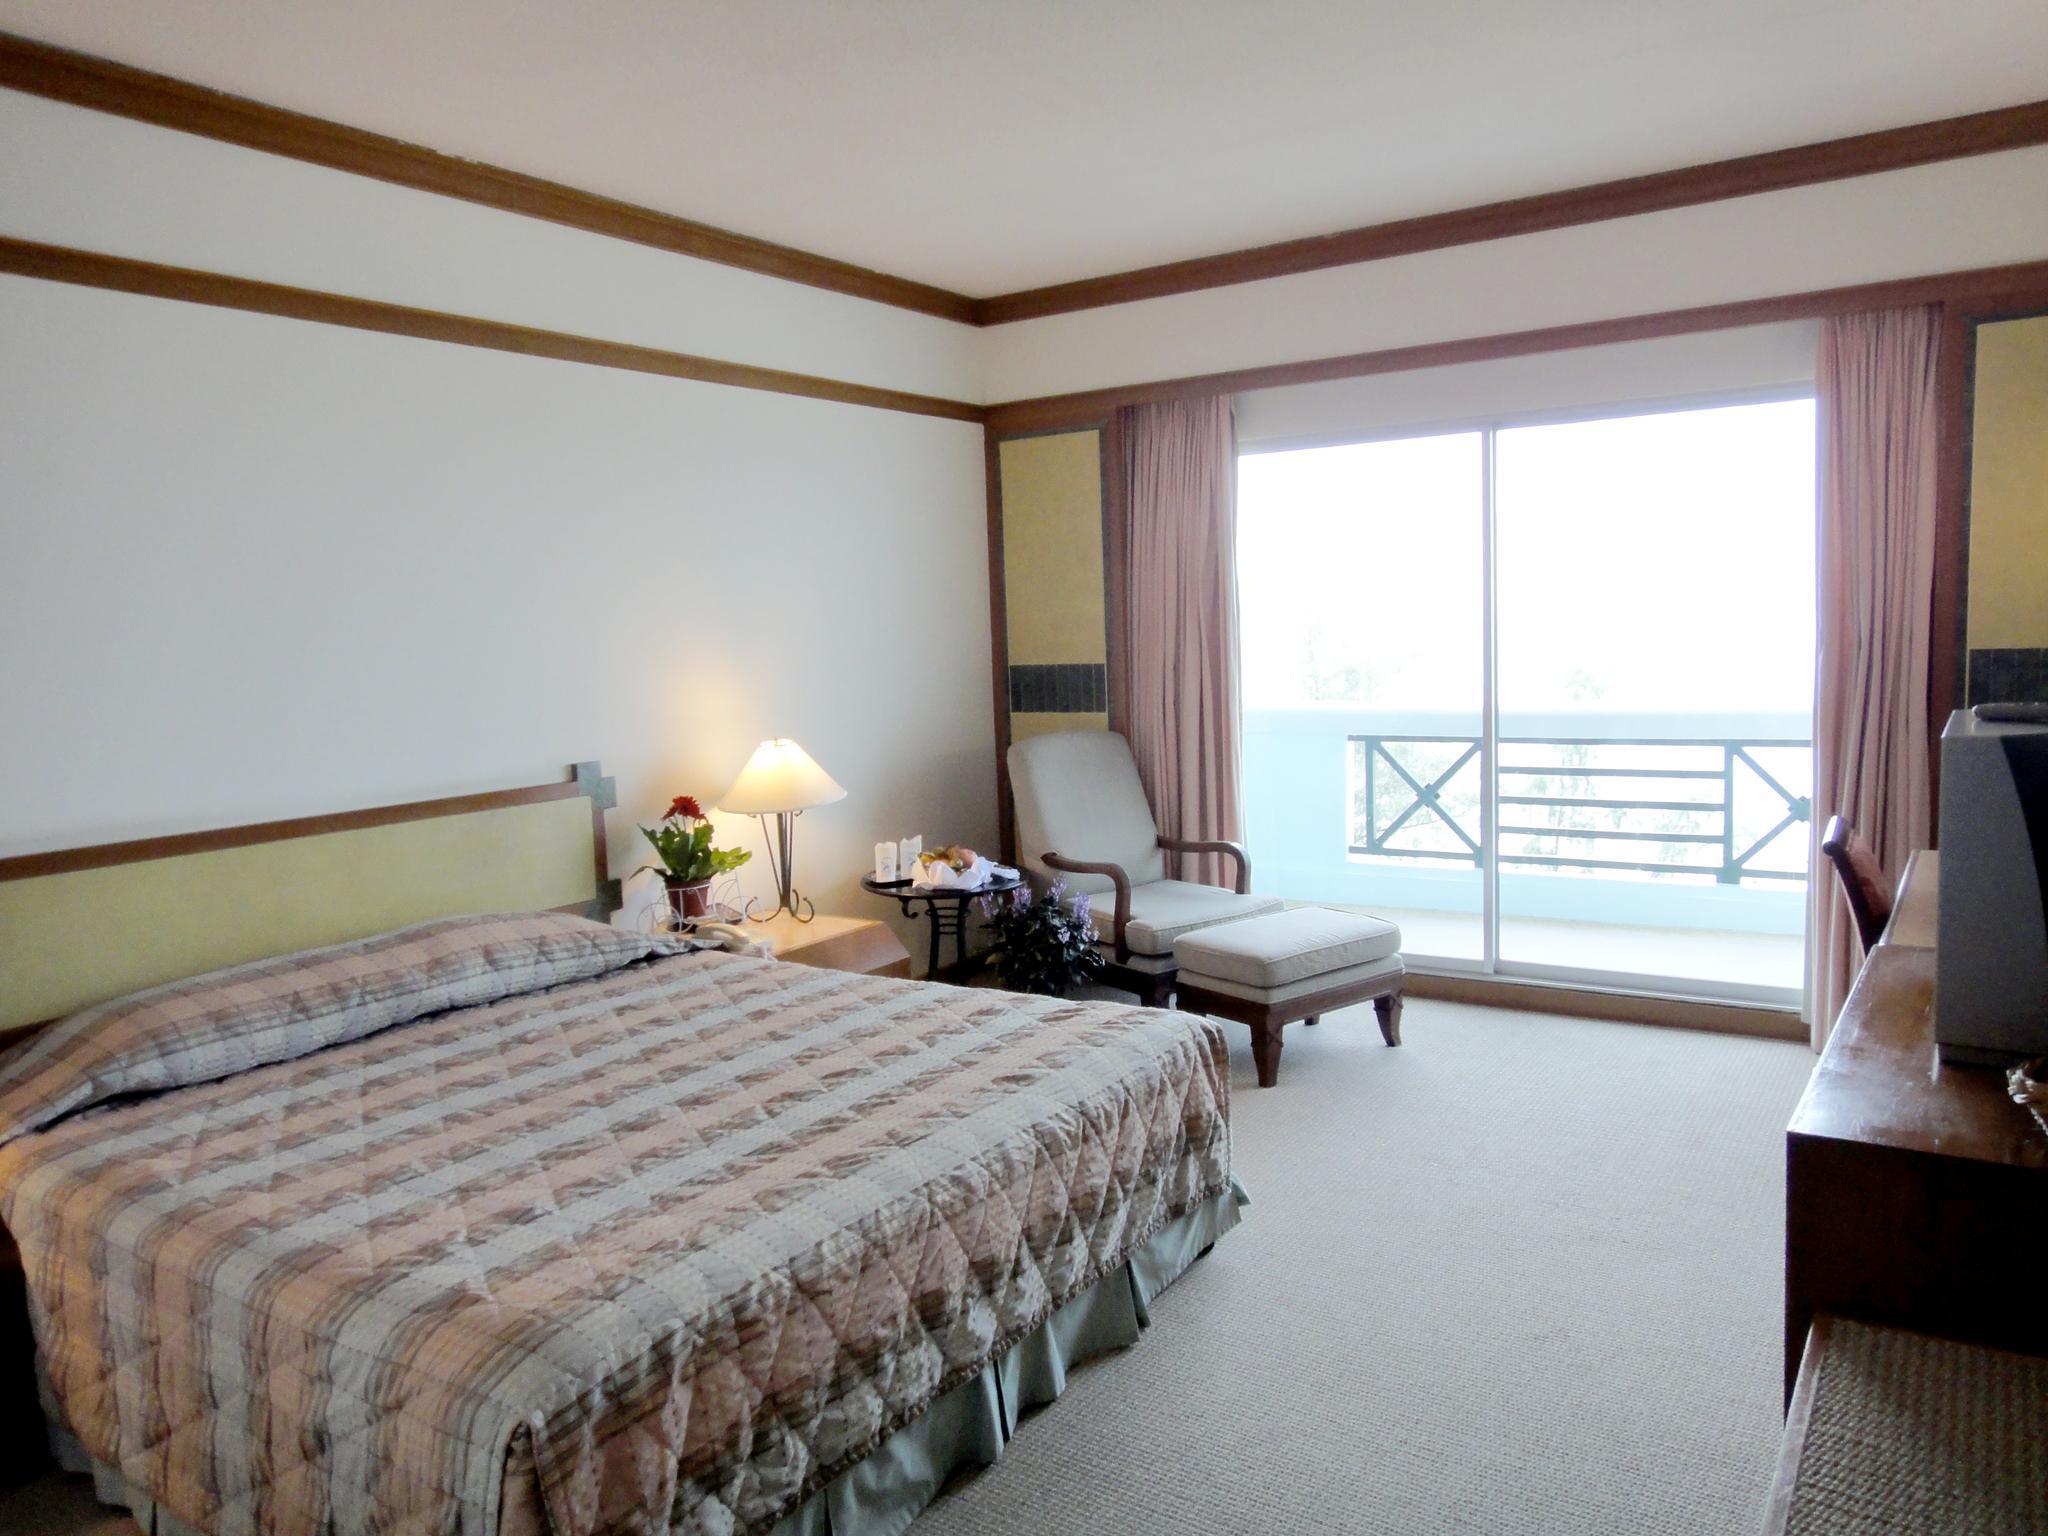 BP Samila Beach Hotel & Resort บีพี สมิหลา บีช โฮเต็ล แอนด์ รีสอร์ต